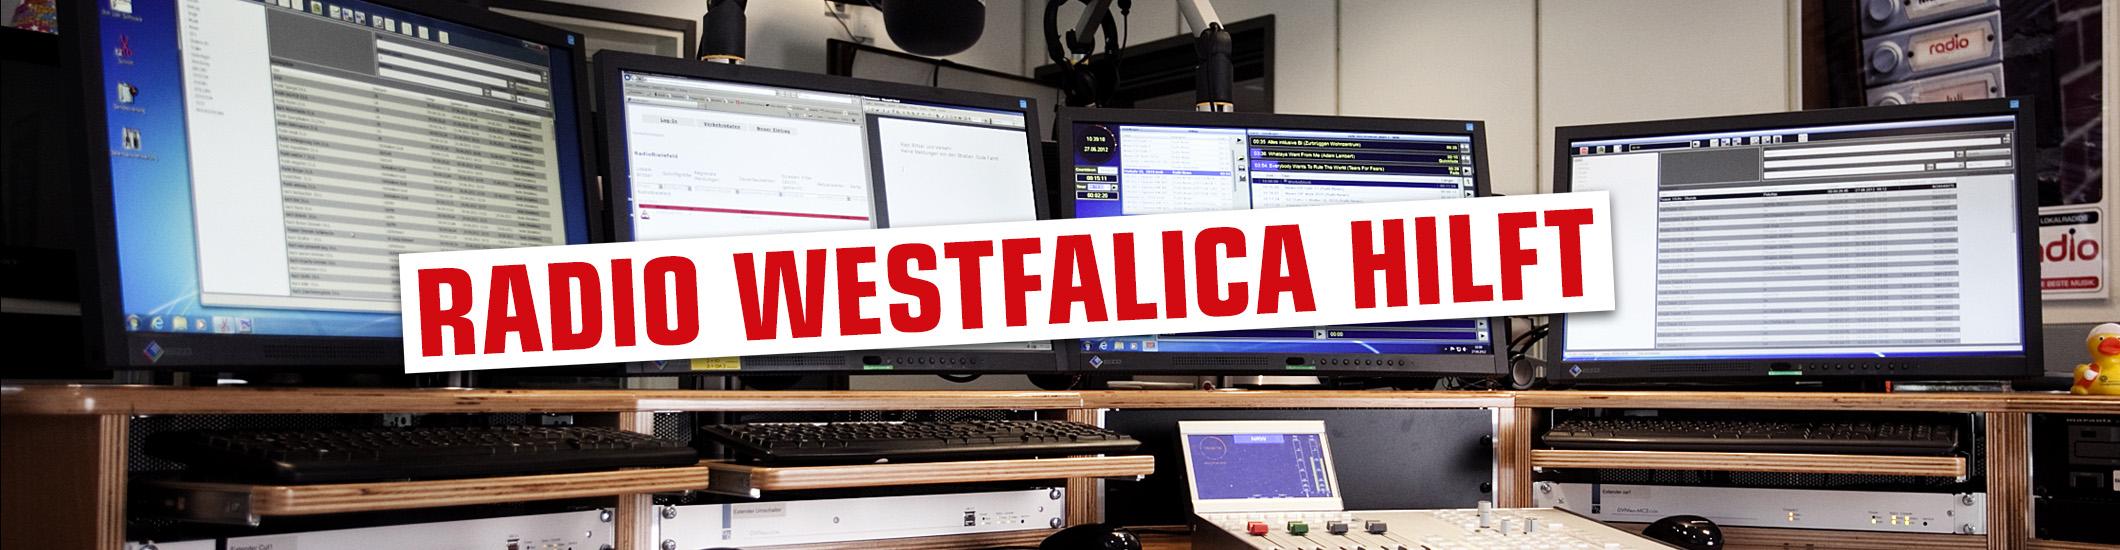 Radio Westfalica Hilft